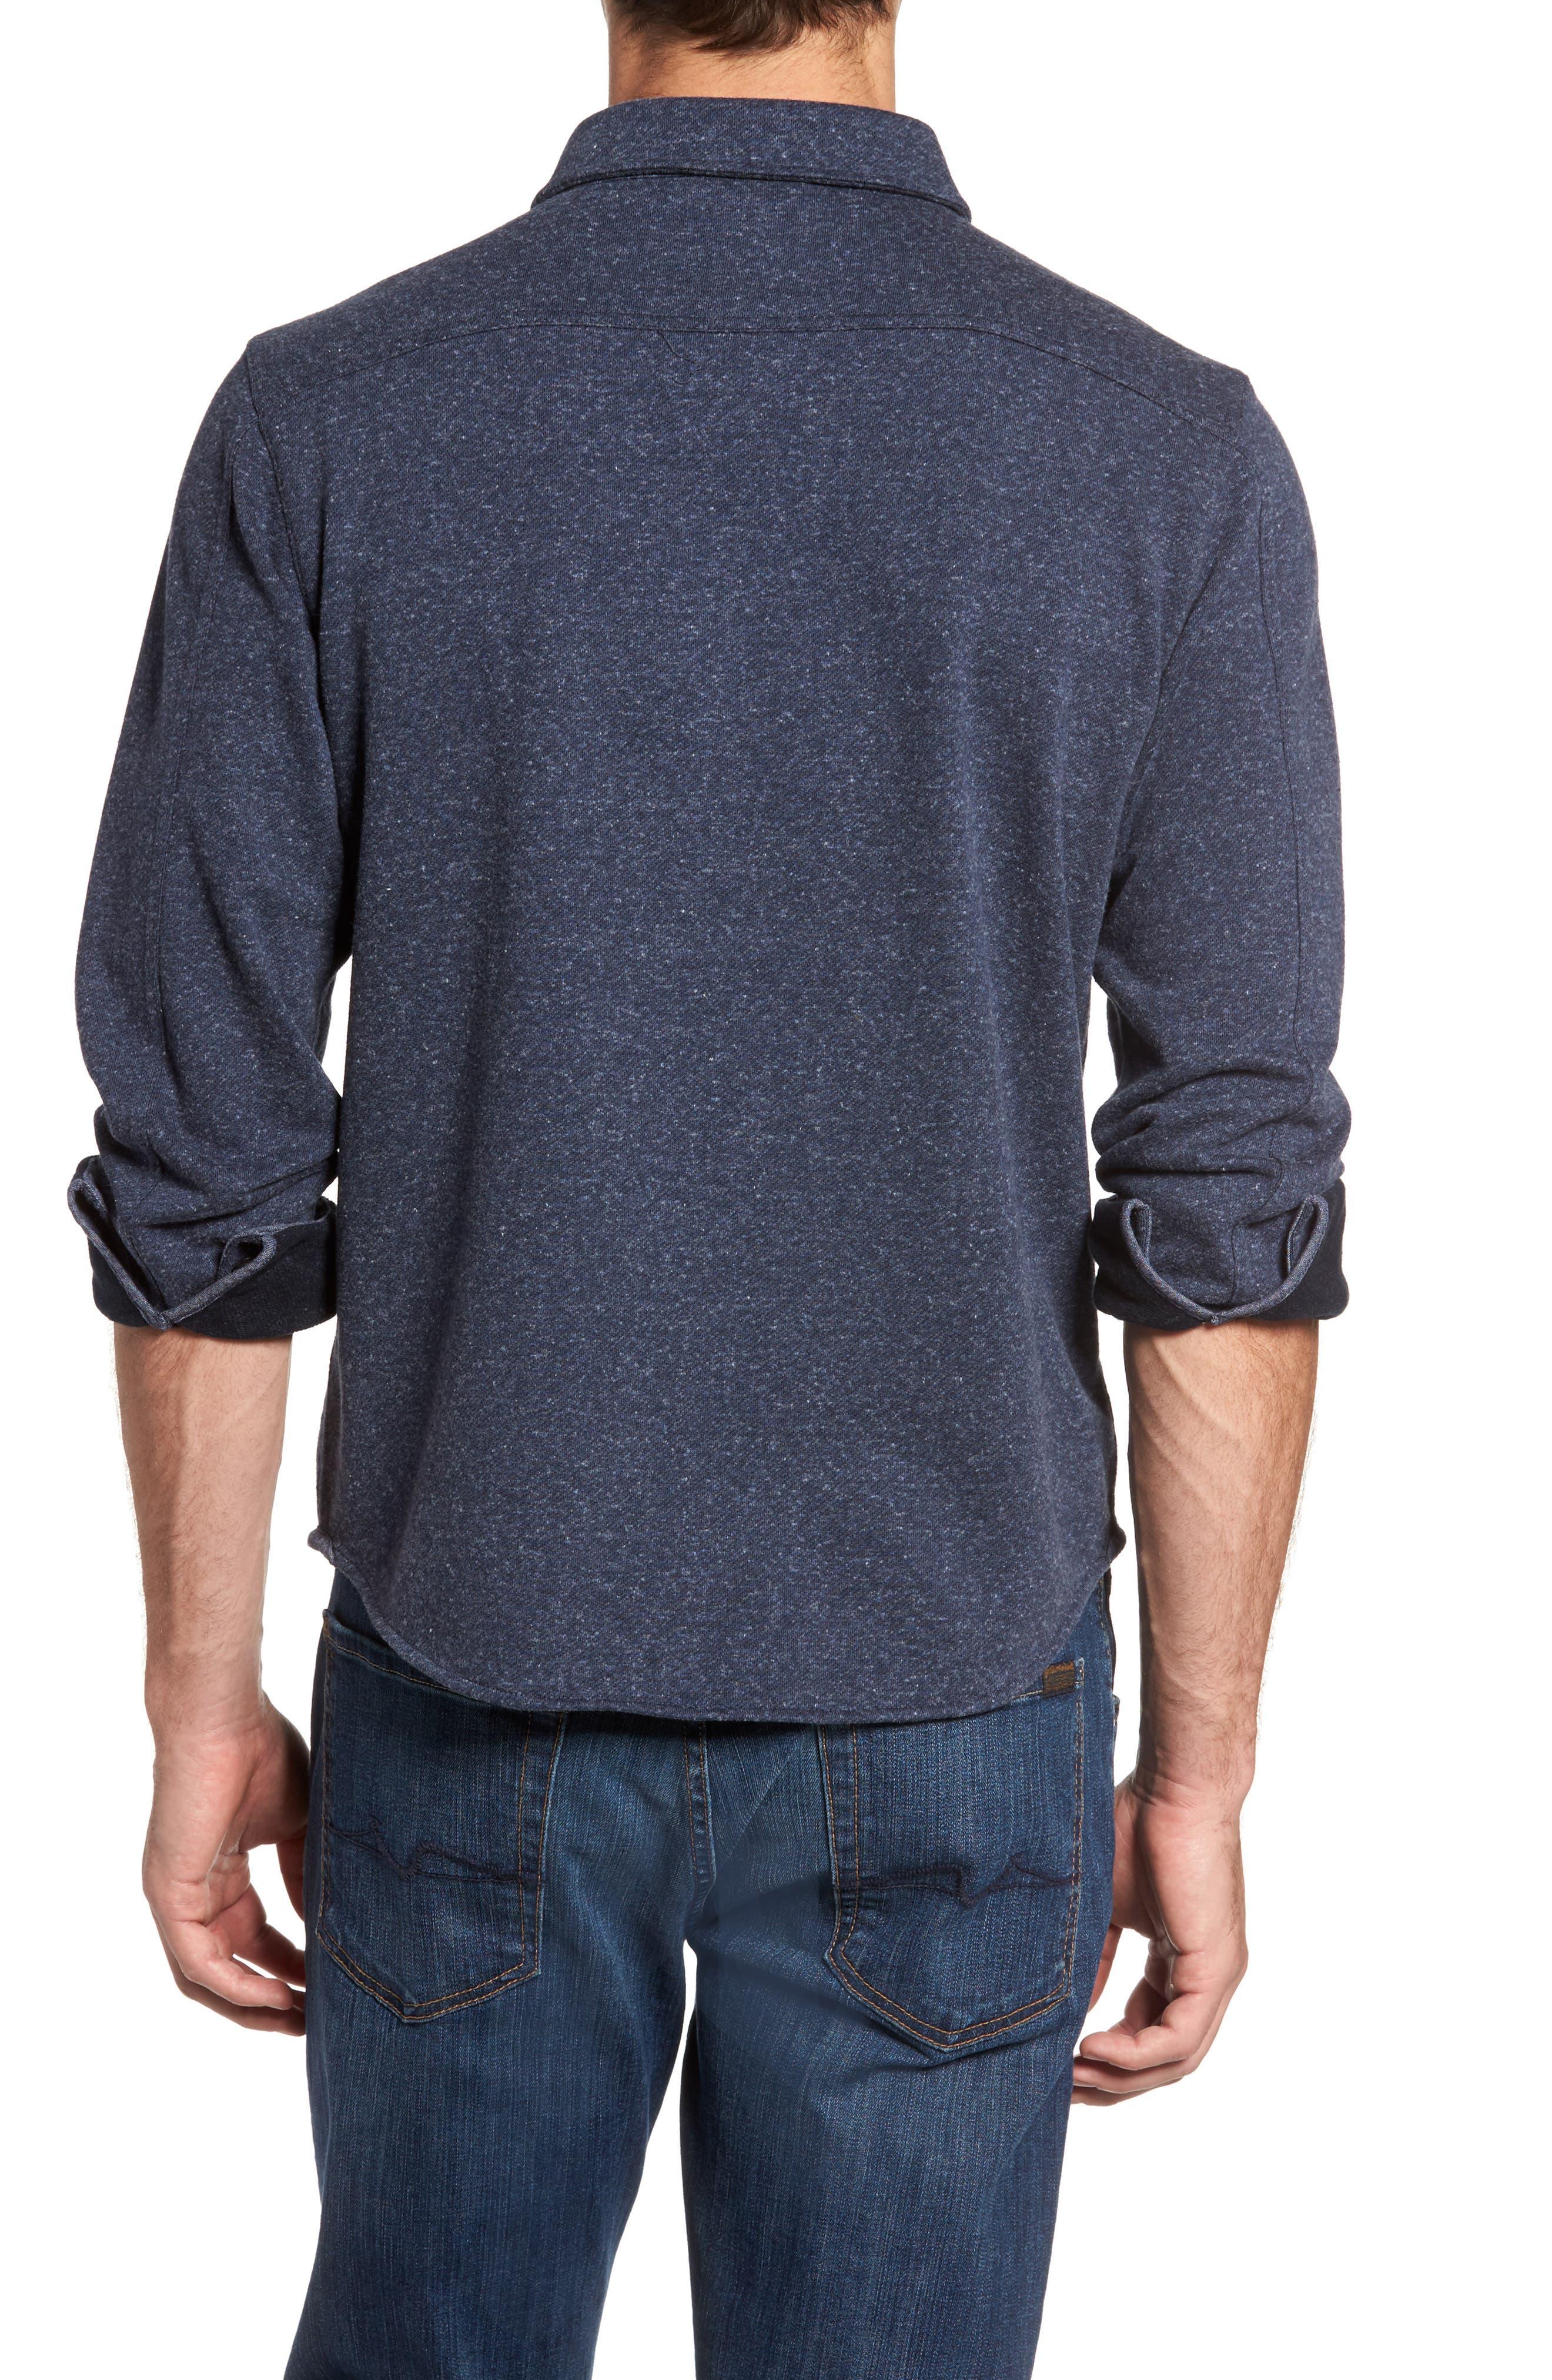 Bayswater Modern Fit Heathered Shirt Jacket,                             Alternate thumbnail 2, color,                             Navy Heather